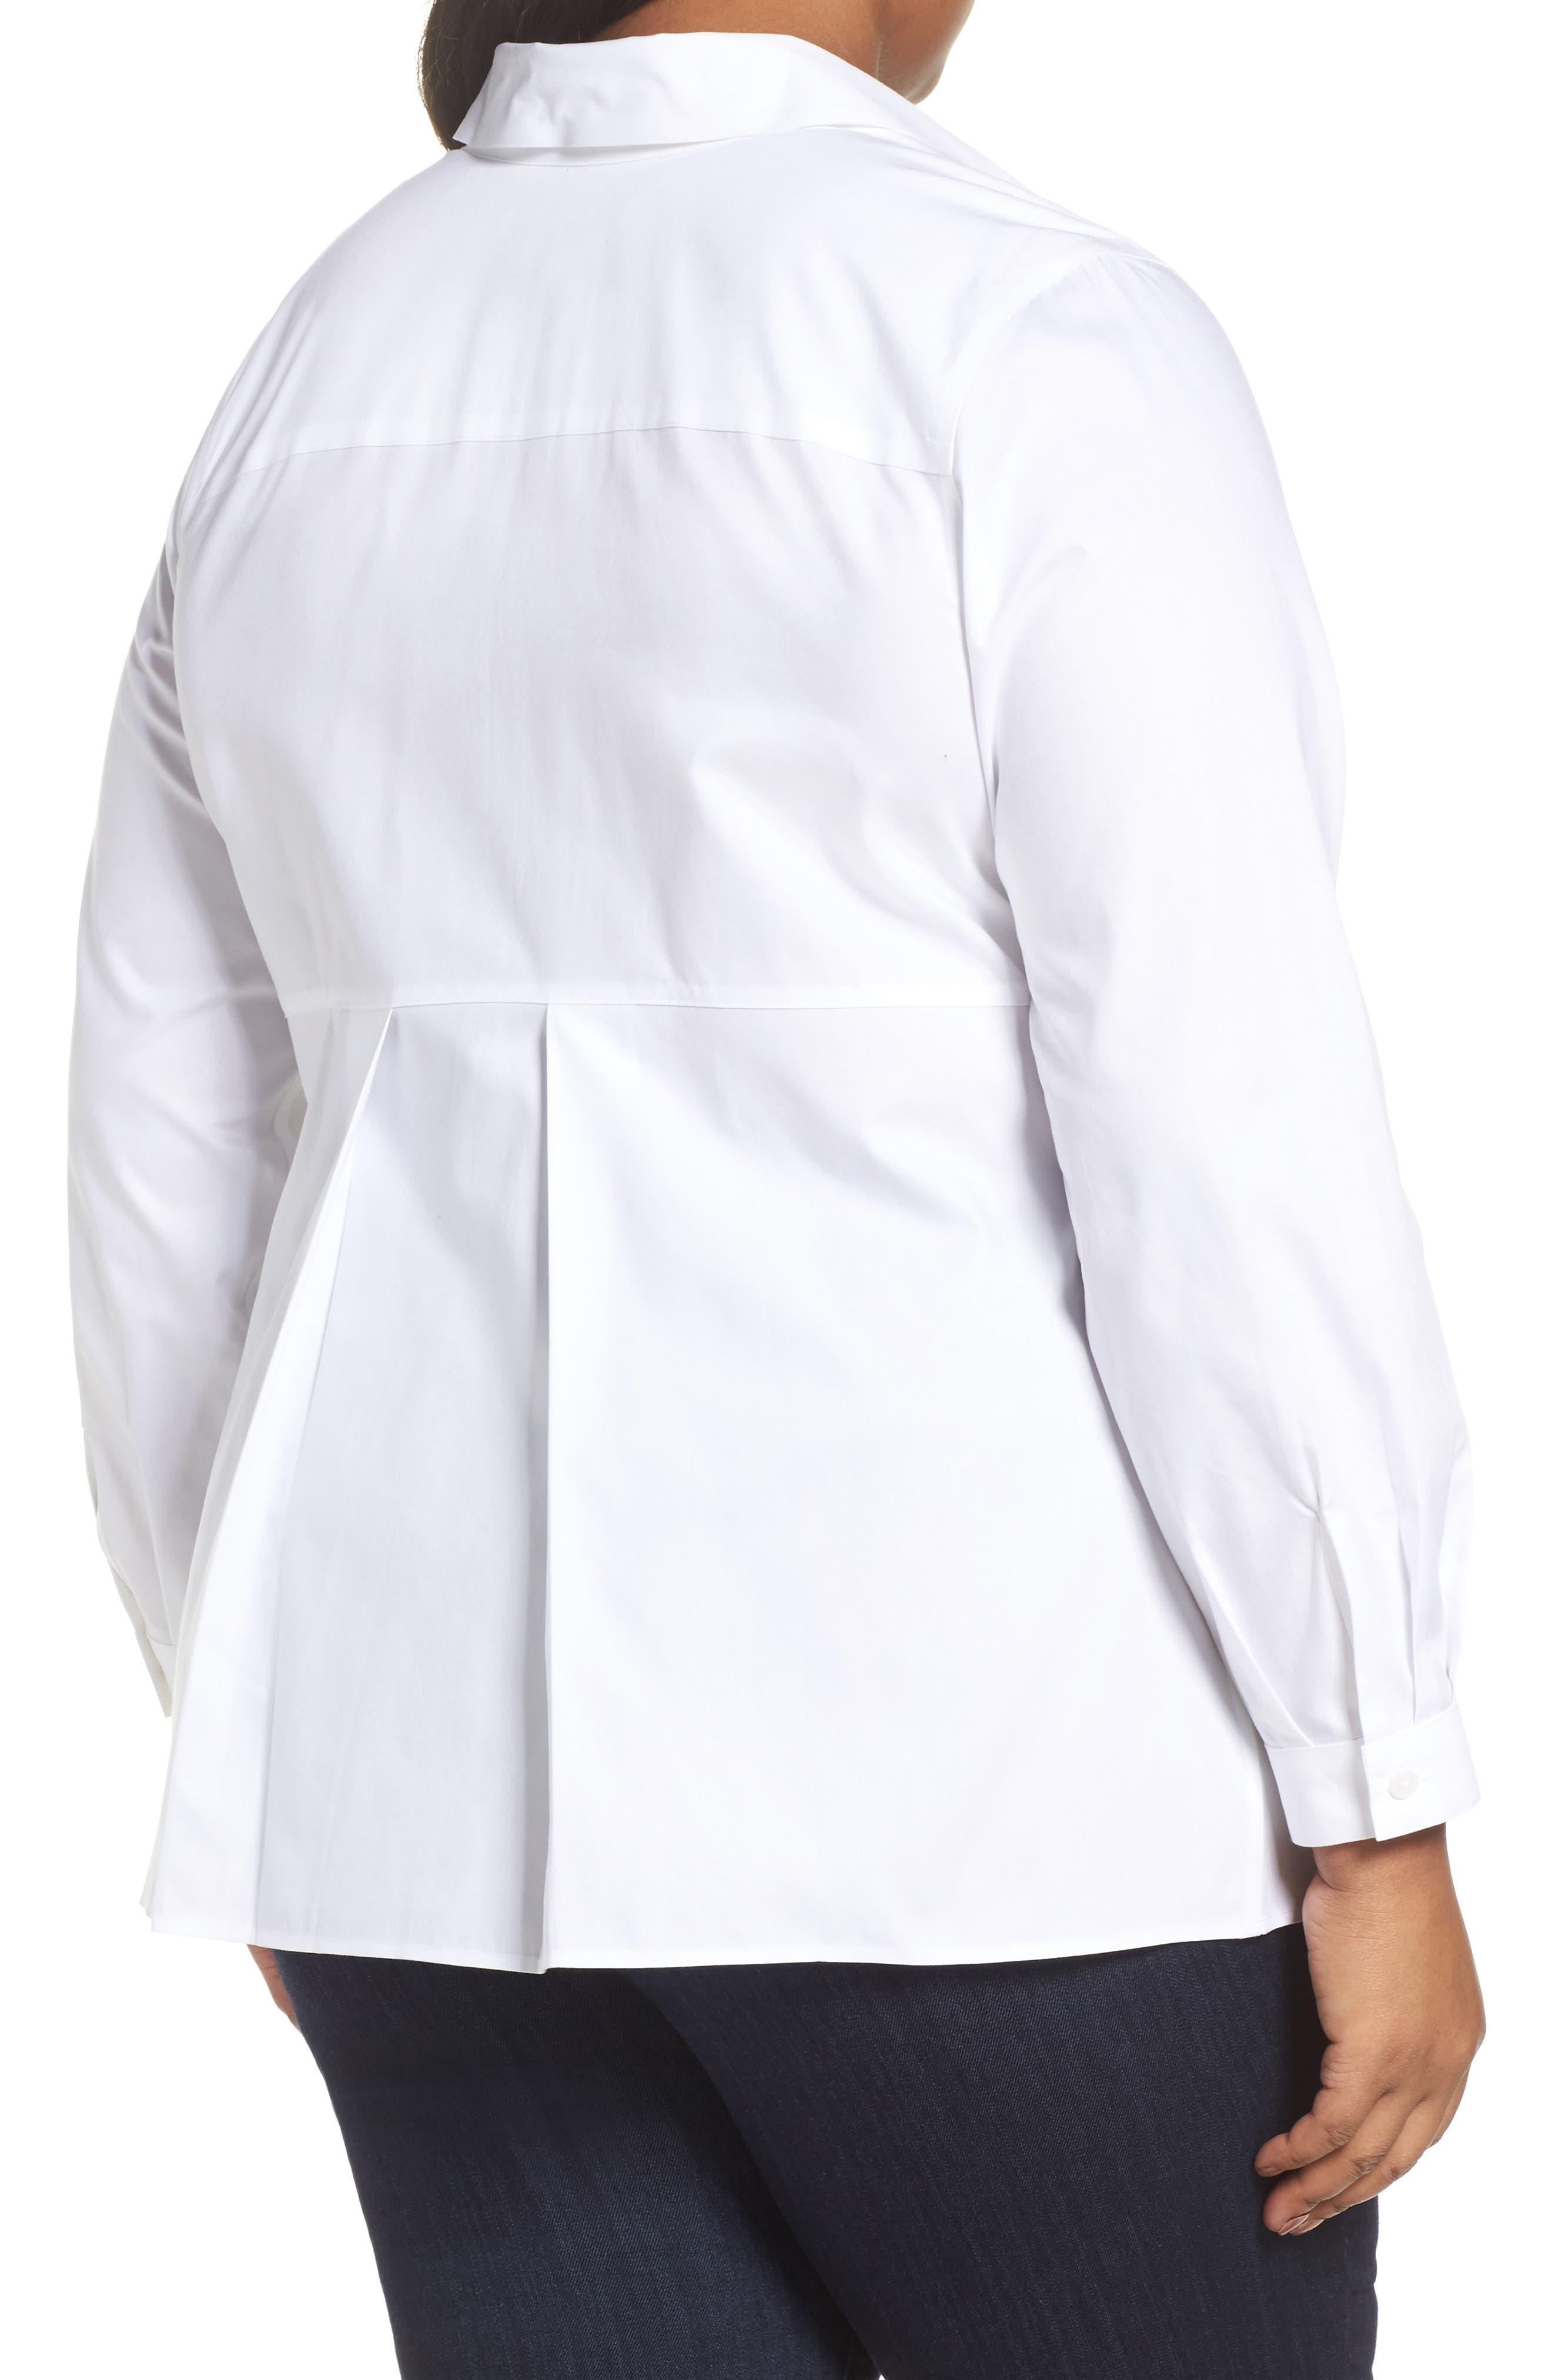 Pinpoint Oxford Cloth Shirt,                             Alternate thumbnail 4, color,